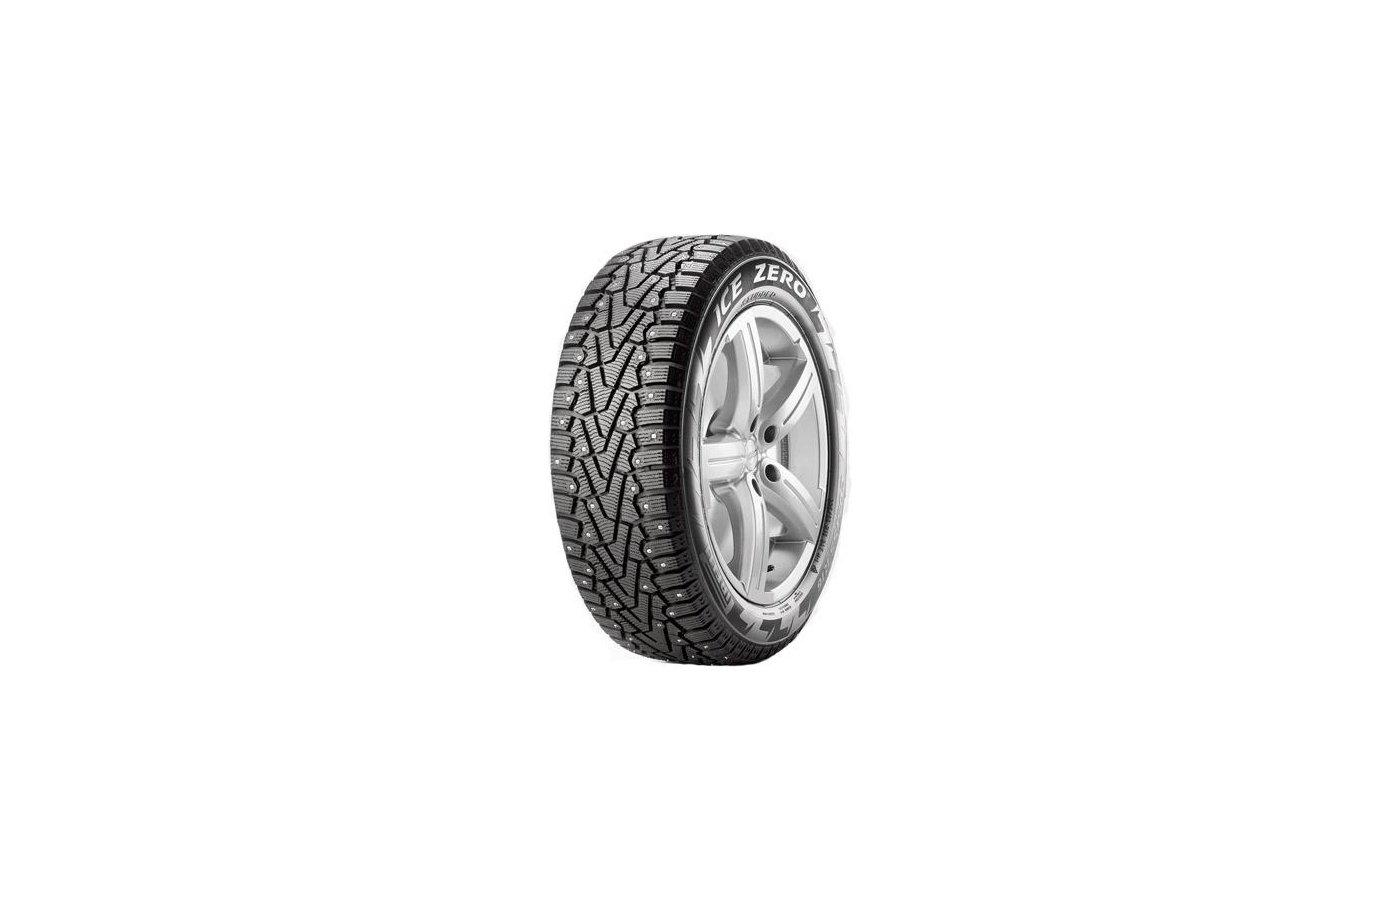 Шина Pirelli Winter Ice Zero 205/55 R16 TL 94T XL шип